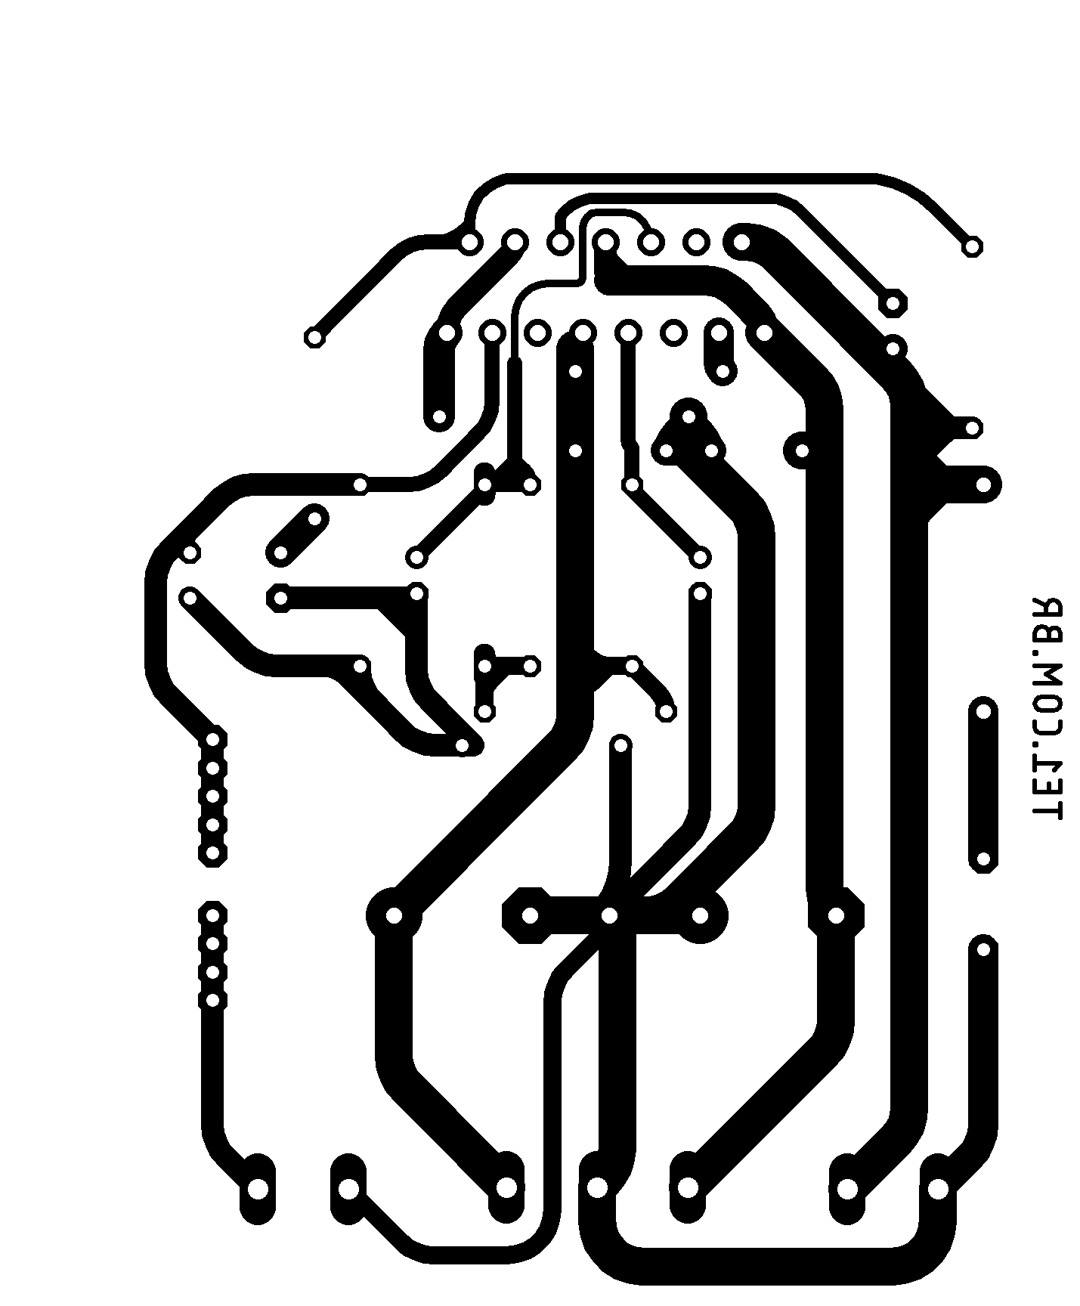 amplificador tda7294 pcb Amplificador potencia audio com tda7294 80W atualizado em 10/2010